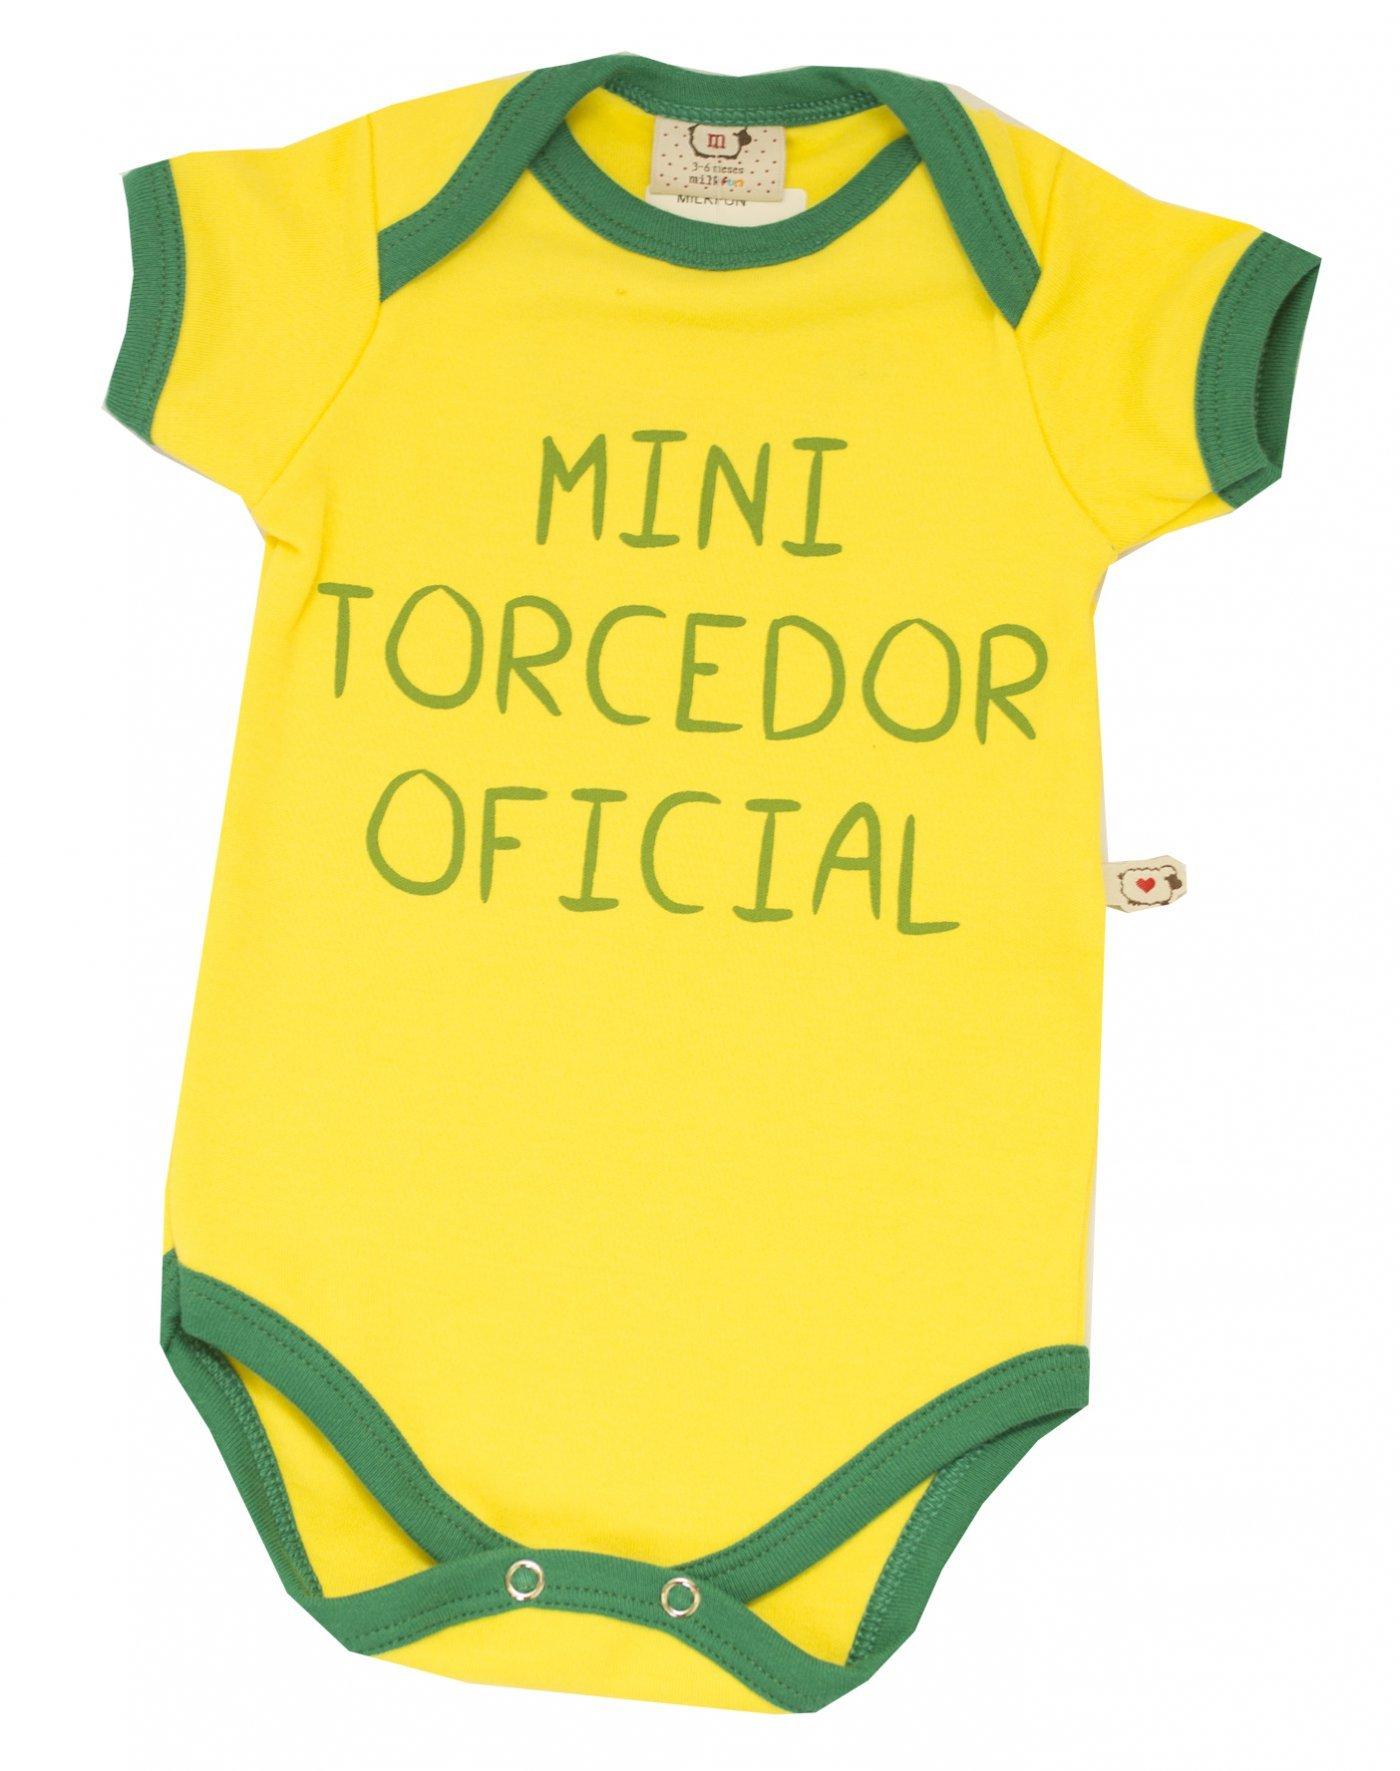 Mini torcedor